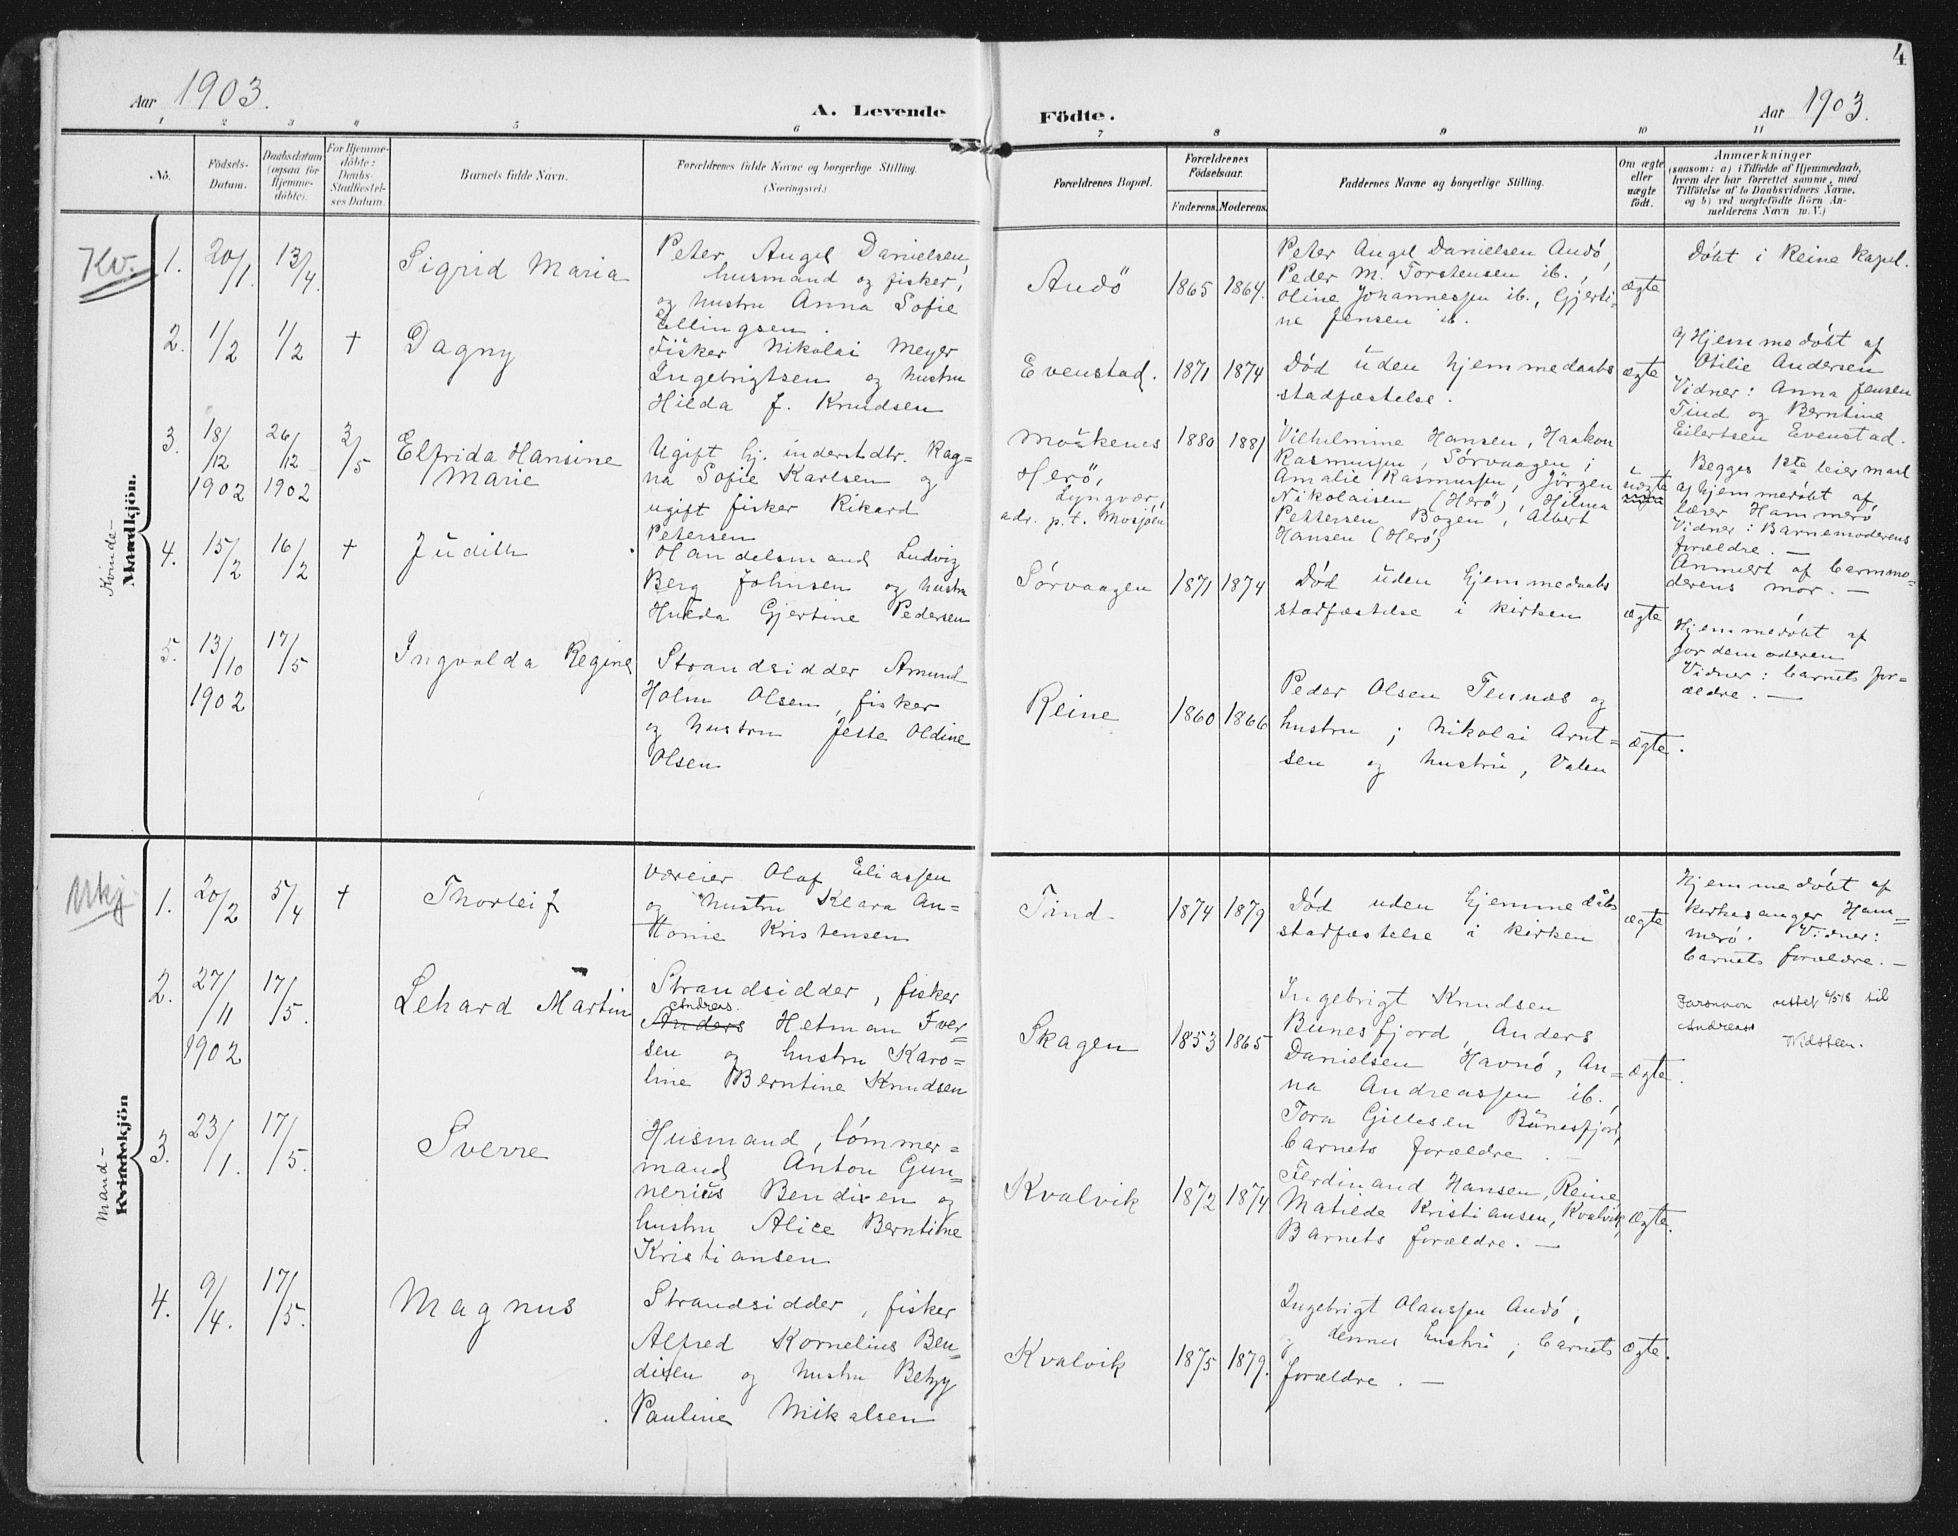 SAT, Ministerialprotokoller, klokkerbøker og fødselsregistre - Nordland, 886/L1221: Ministerialbok nr. 886A03, 1903-1913, s. 4